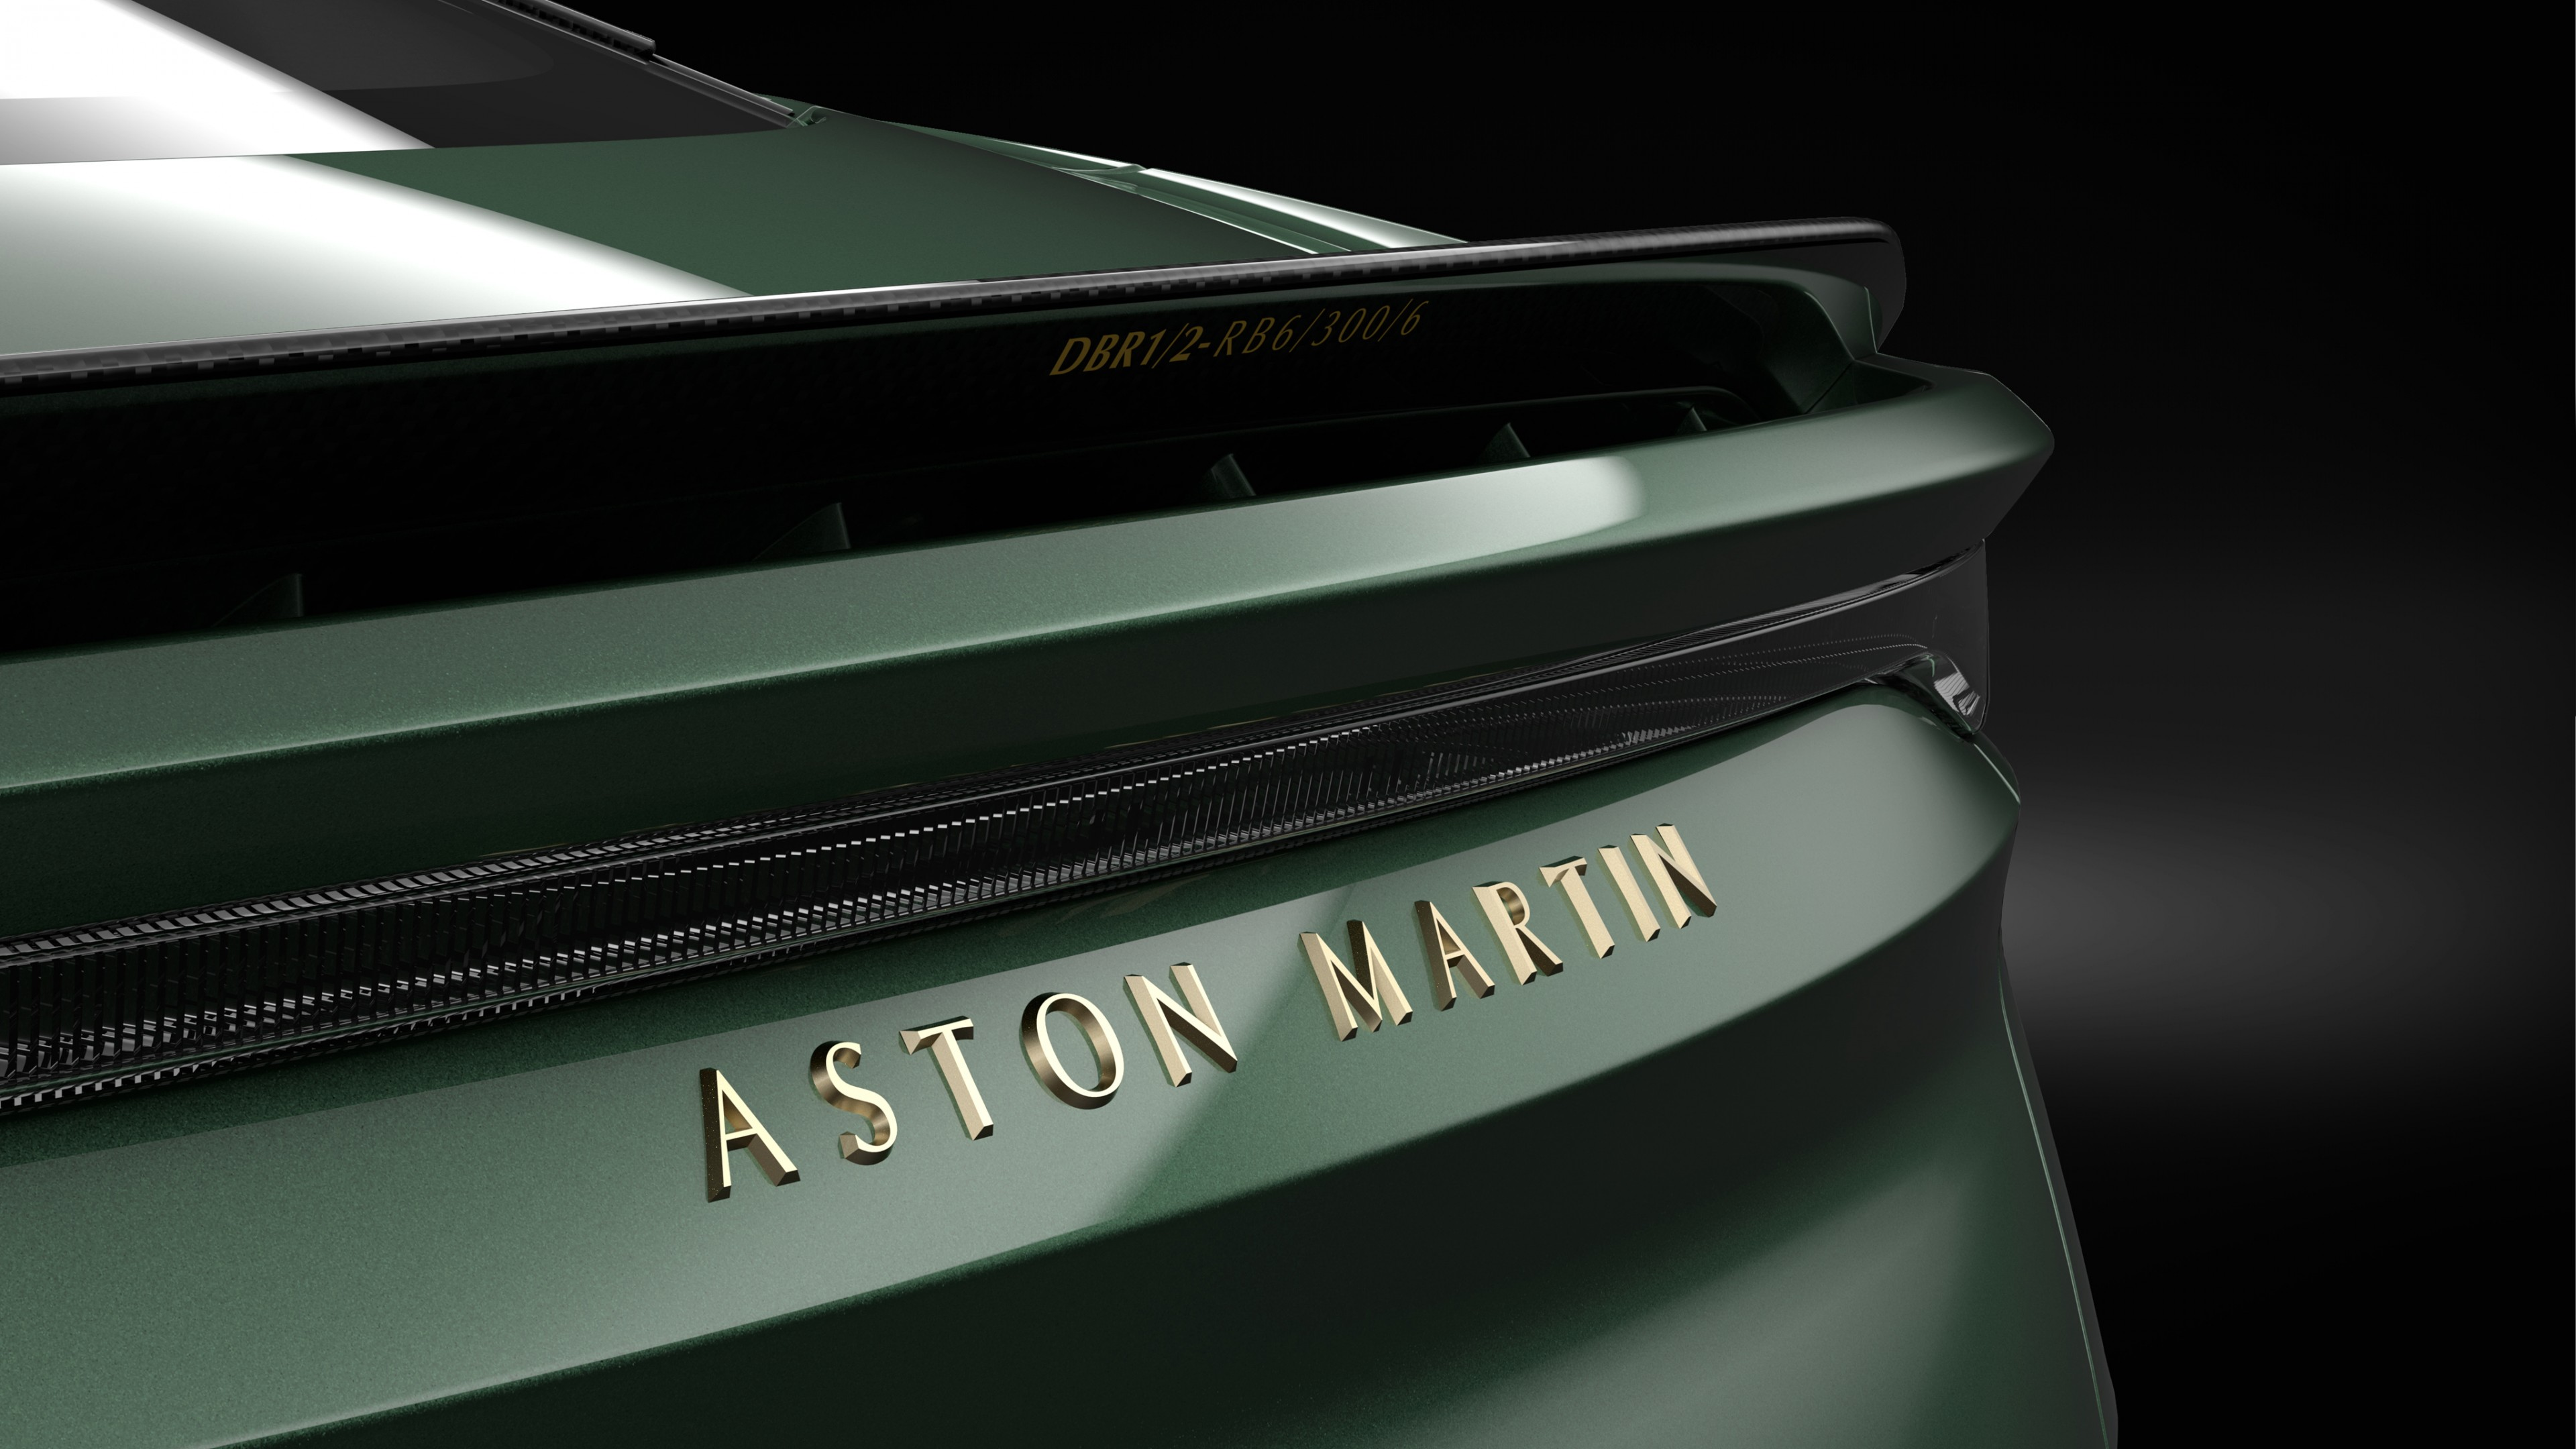 Q By Aston Martin Dbs 59 2018 4k 4 Wallpaper Hd Car Wallpapers Id 11502